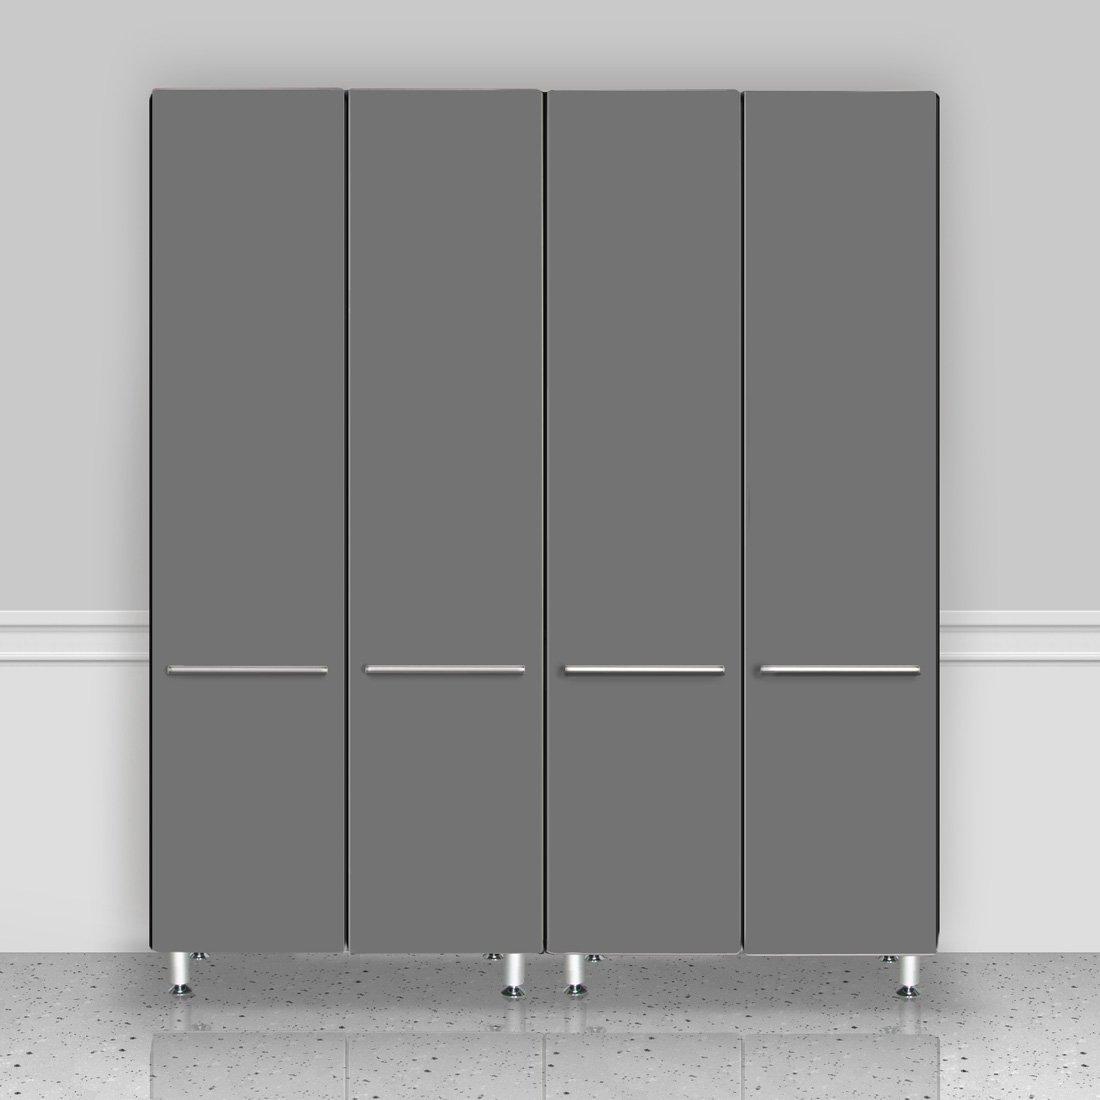 Ulti-MATE Garage GA-062 2-Piece Tall Garage Cabinet Set by Ulti-MATE Garage